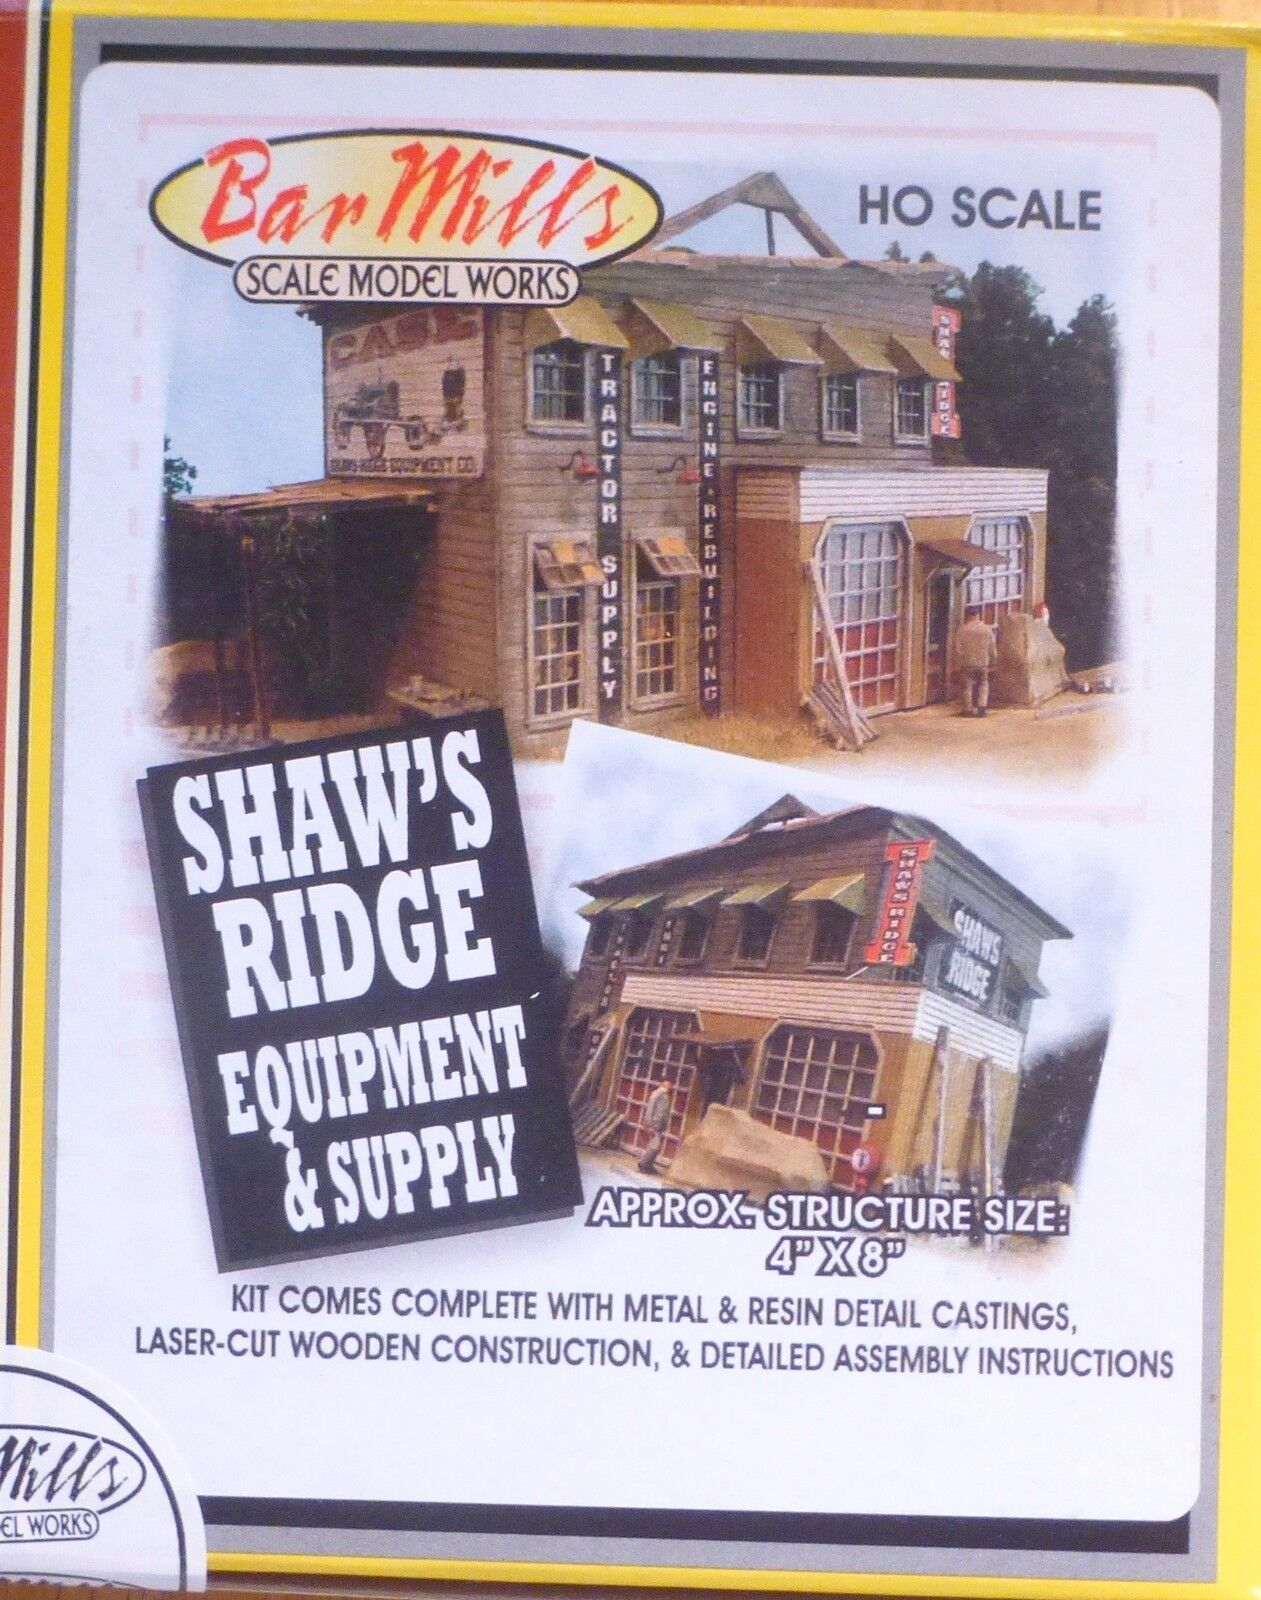 Bar Mills  532  HO Scale  Shaw's Ridge Equipment & Supply -- Kit - 4 x 8  10.2